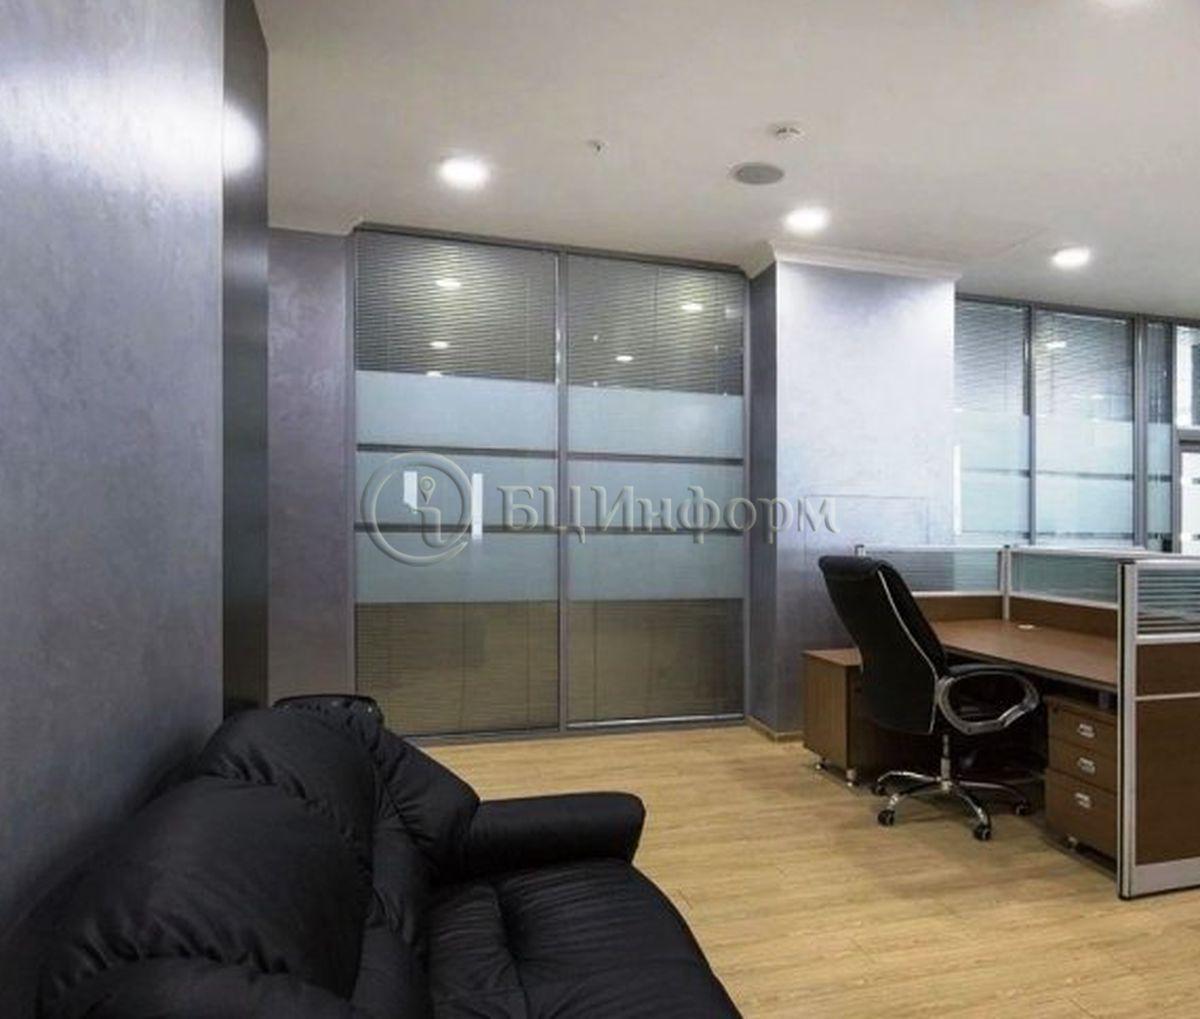 Аренда офиса в районе проспекта мира аренда офиса на левом берегу астаны 2012 год